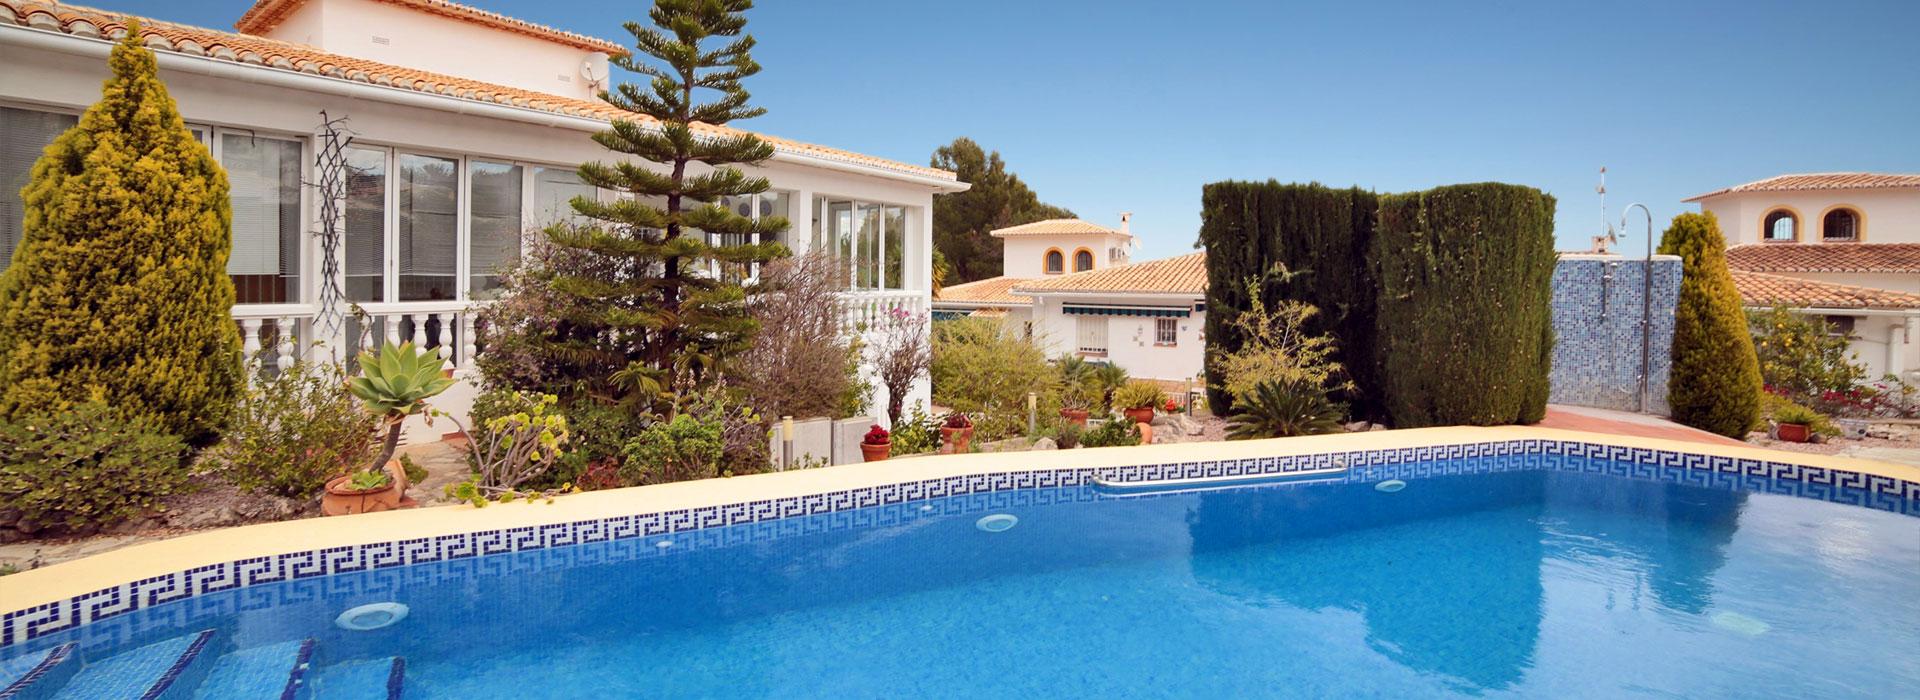 acb.immo - Charmante villa mitoyenne de 3 chambres avec appartement indépendant à Rafol d'Almunia, Denia